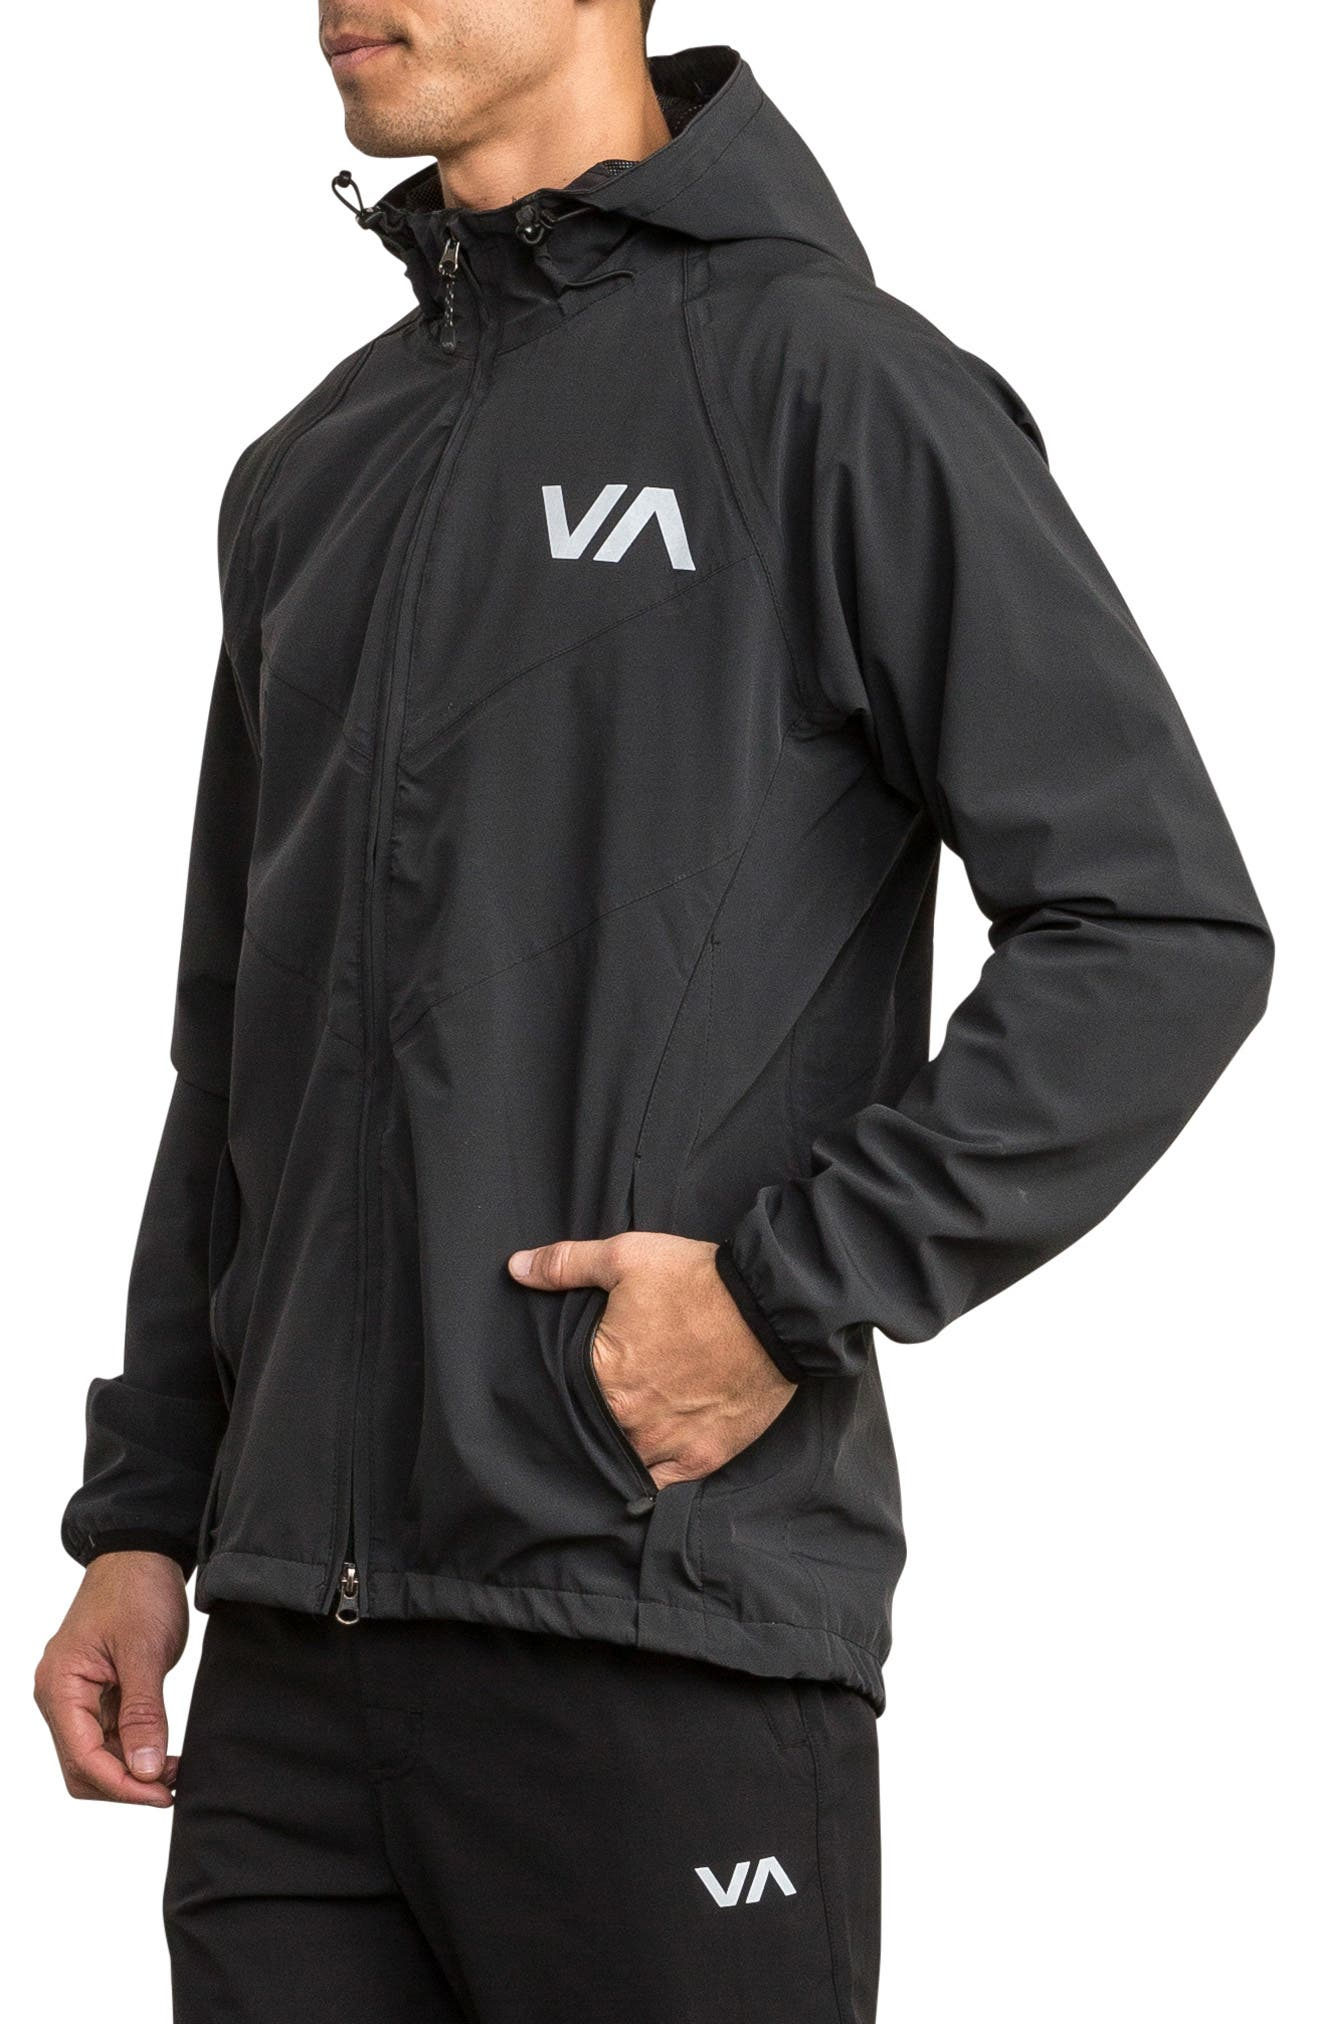 VA Packable Windbreaker,                             Alternate thumbnail 3, color,                             BLACK